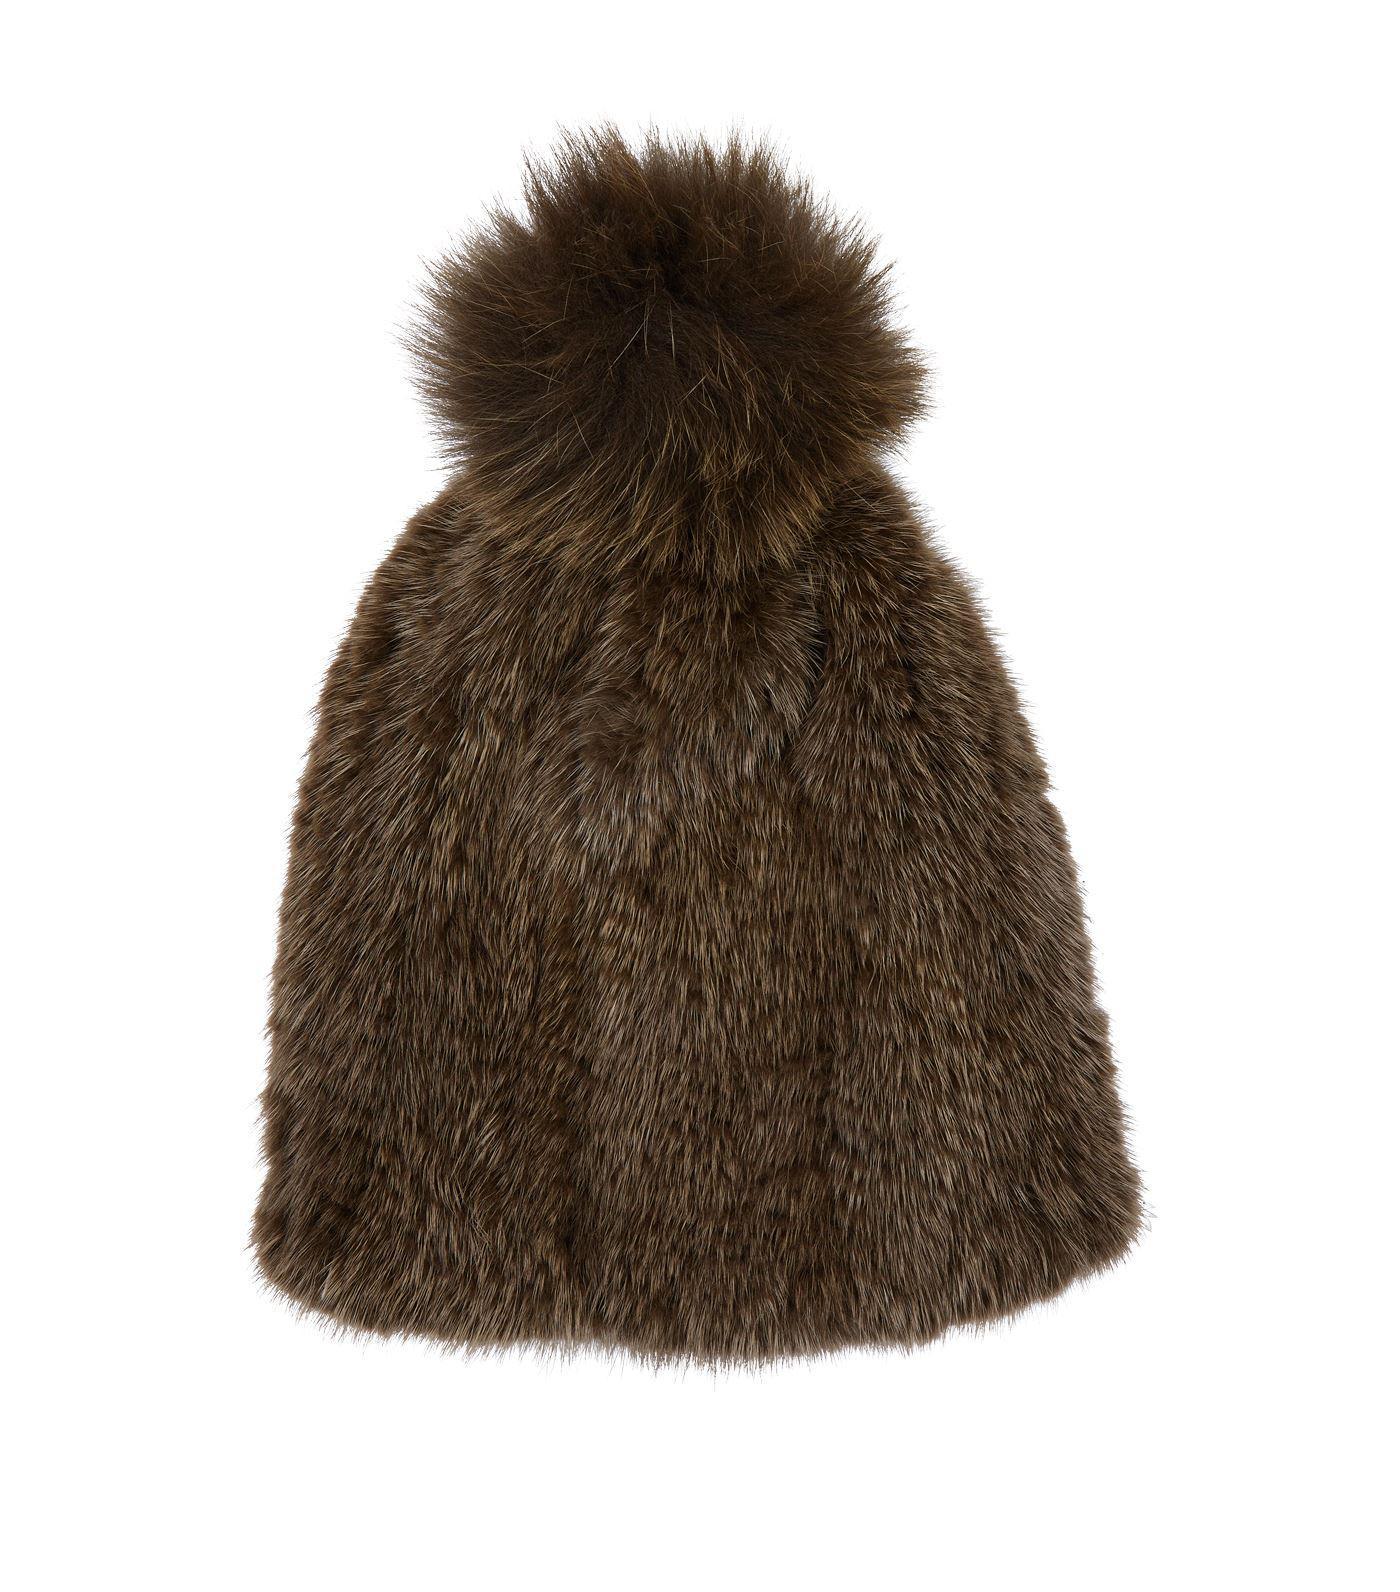 07068b3310e Lyst - Yves Salomon Mink Fur Pom Pom Hat in Green